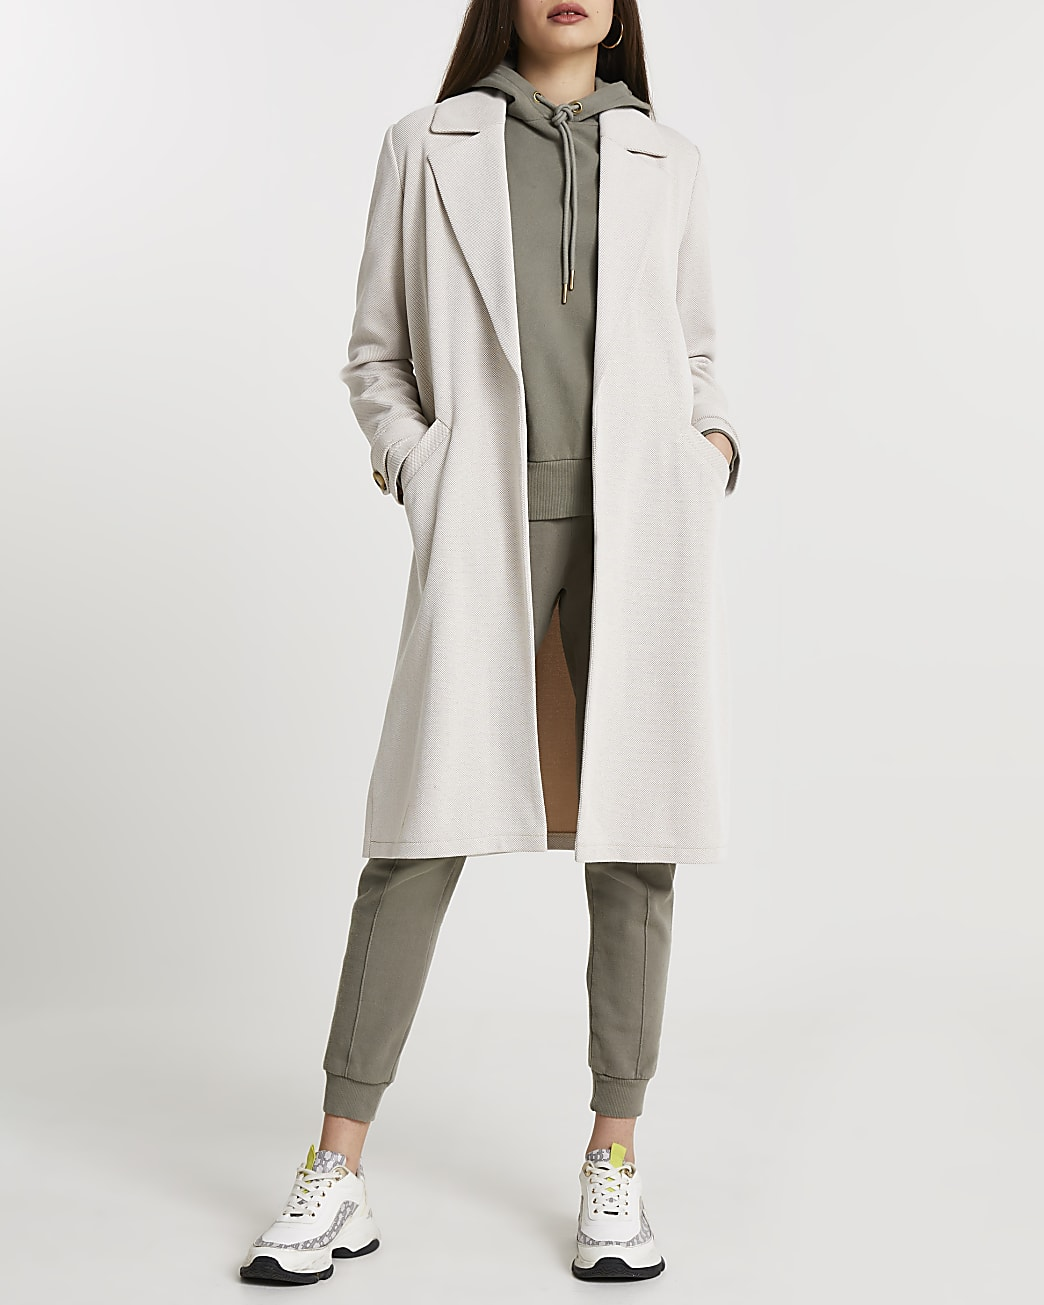 Cream jersey duster jacket